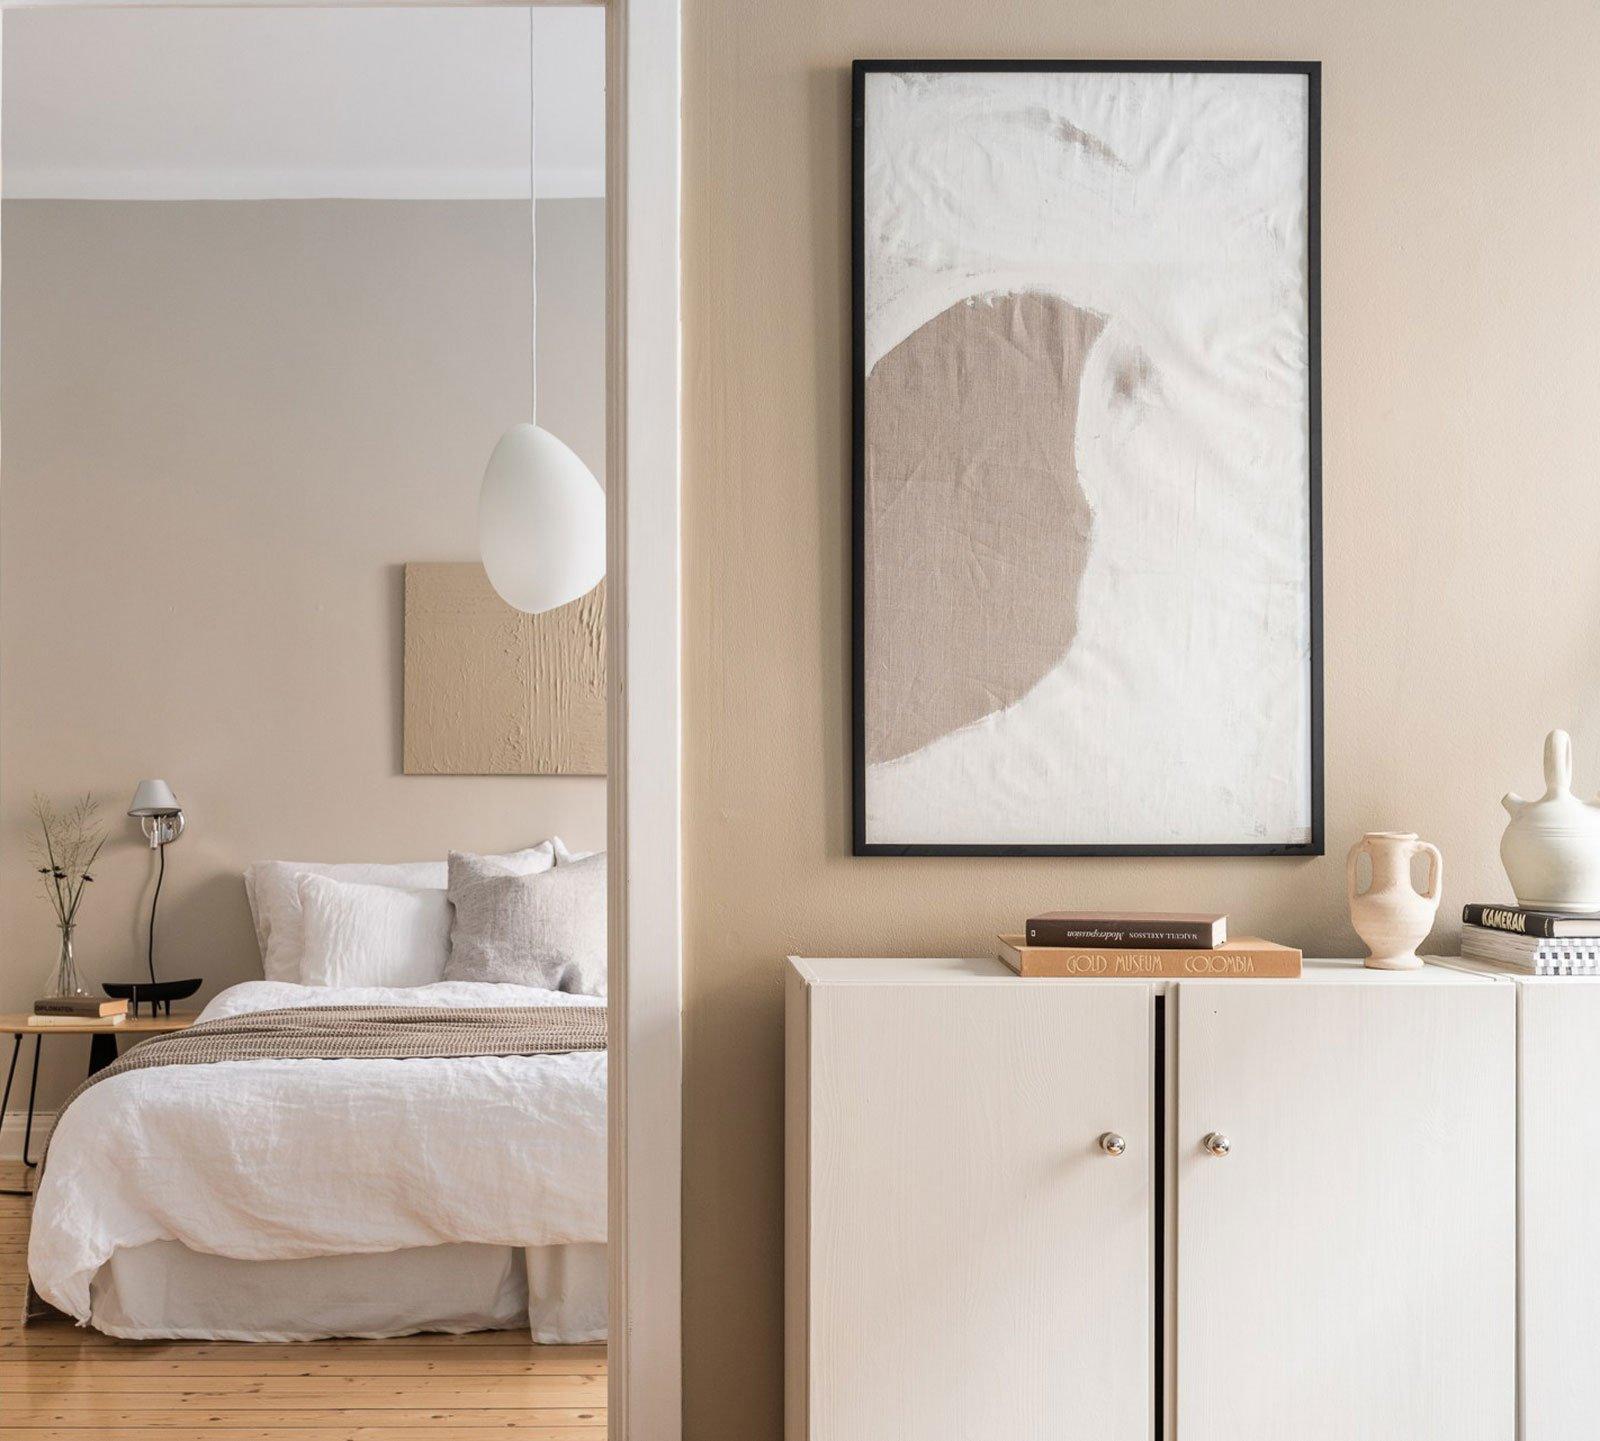 beige bedroom hygge warm